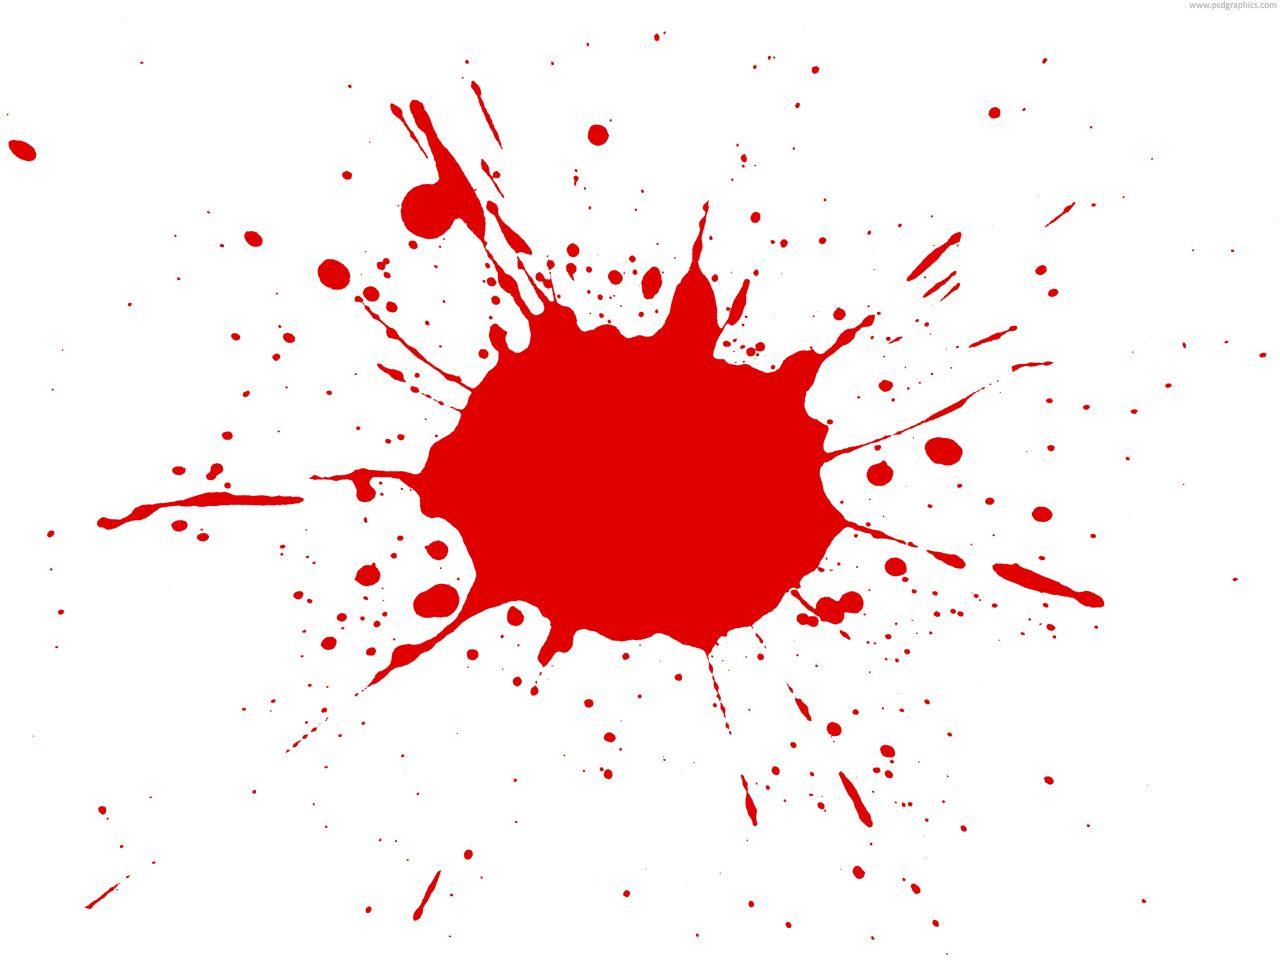 Paint Splatter Painting Paint Splatter Paint Splash